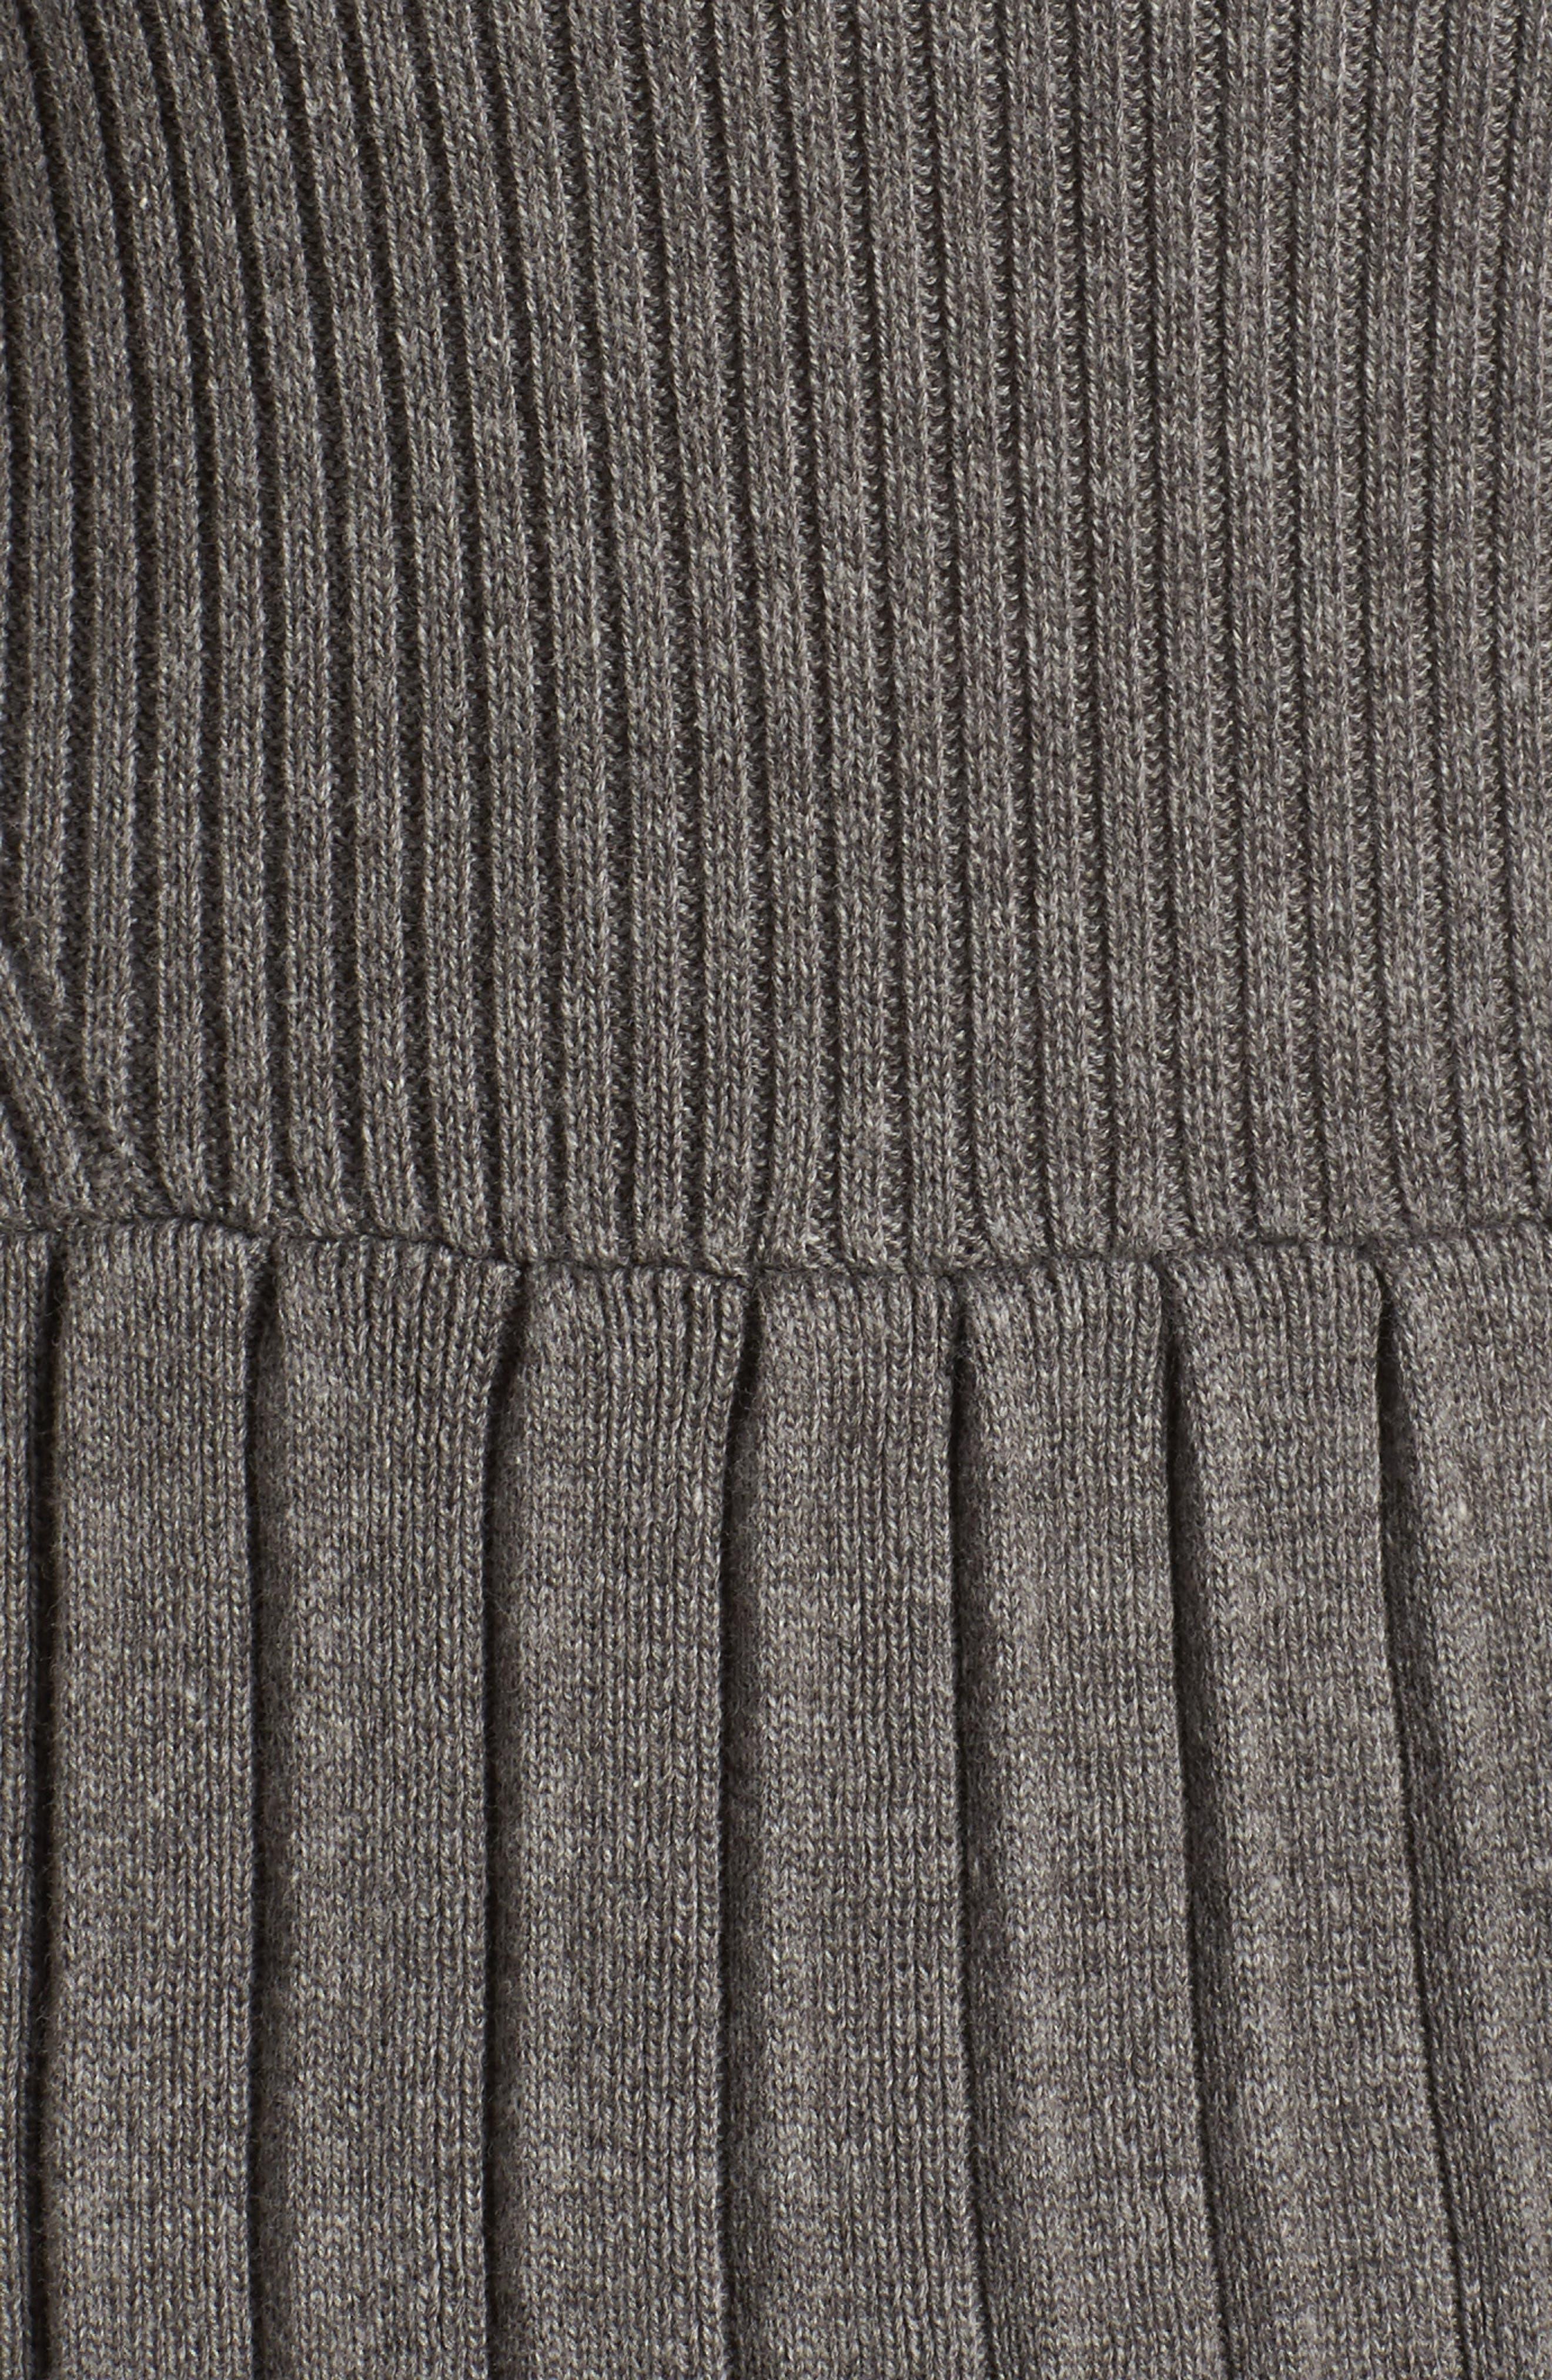 Turtleneck Dress,                             Alternate thumbnail 5, color,                             096